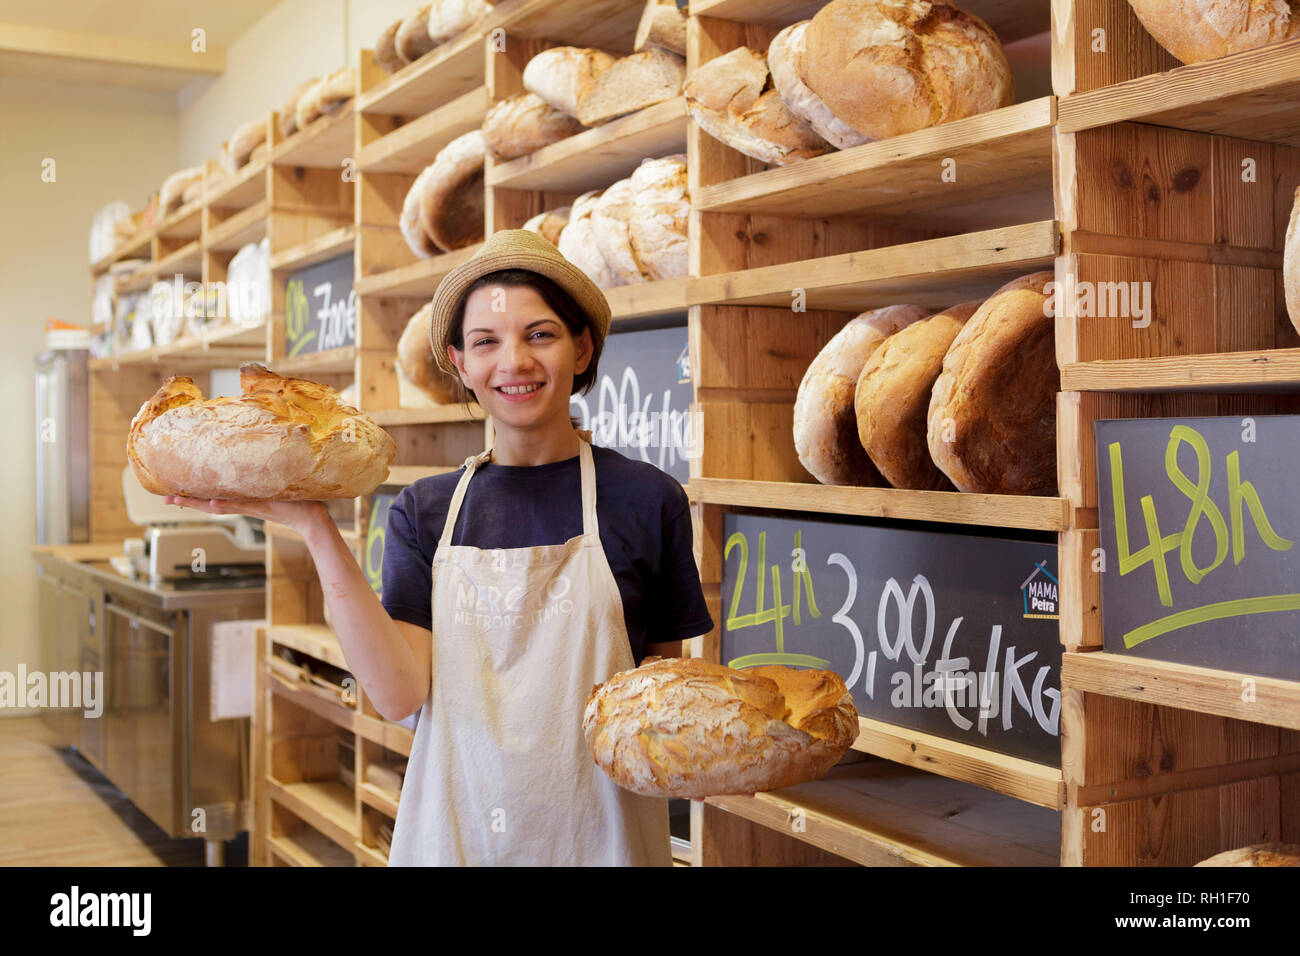 girl holding bread, mercato metropolitano, milan, italy - Stock Image